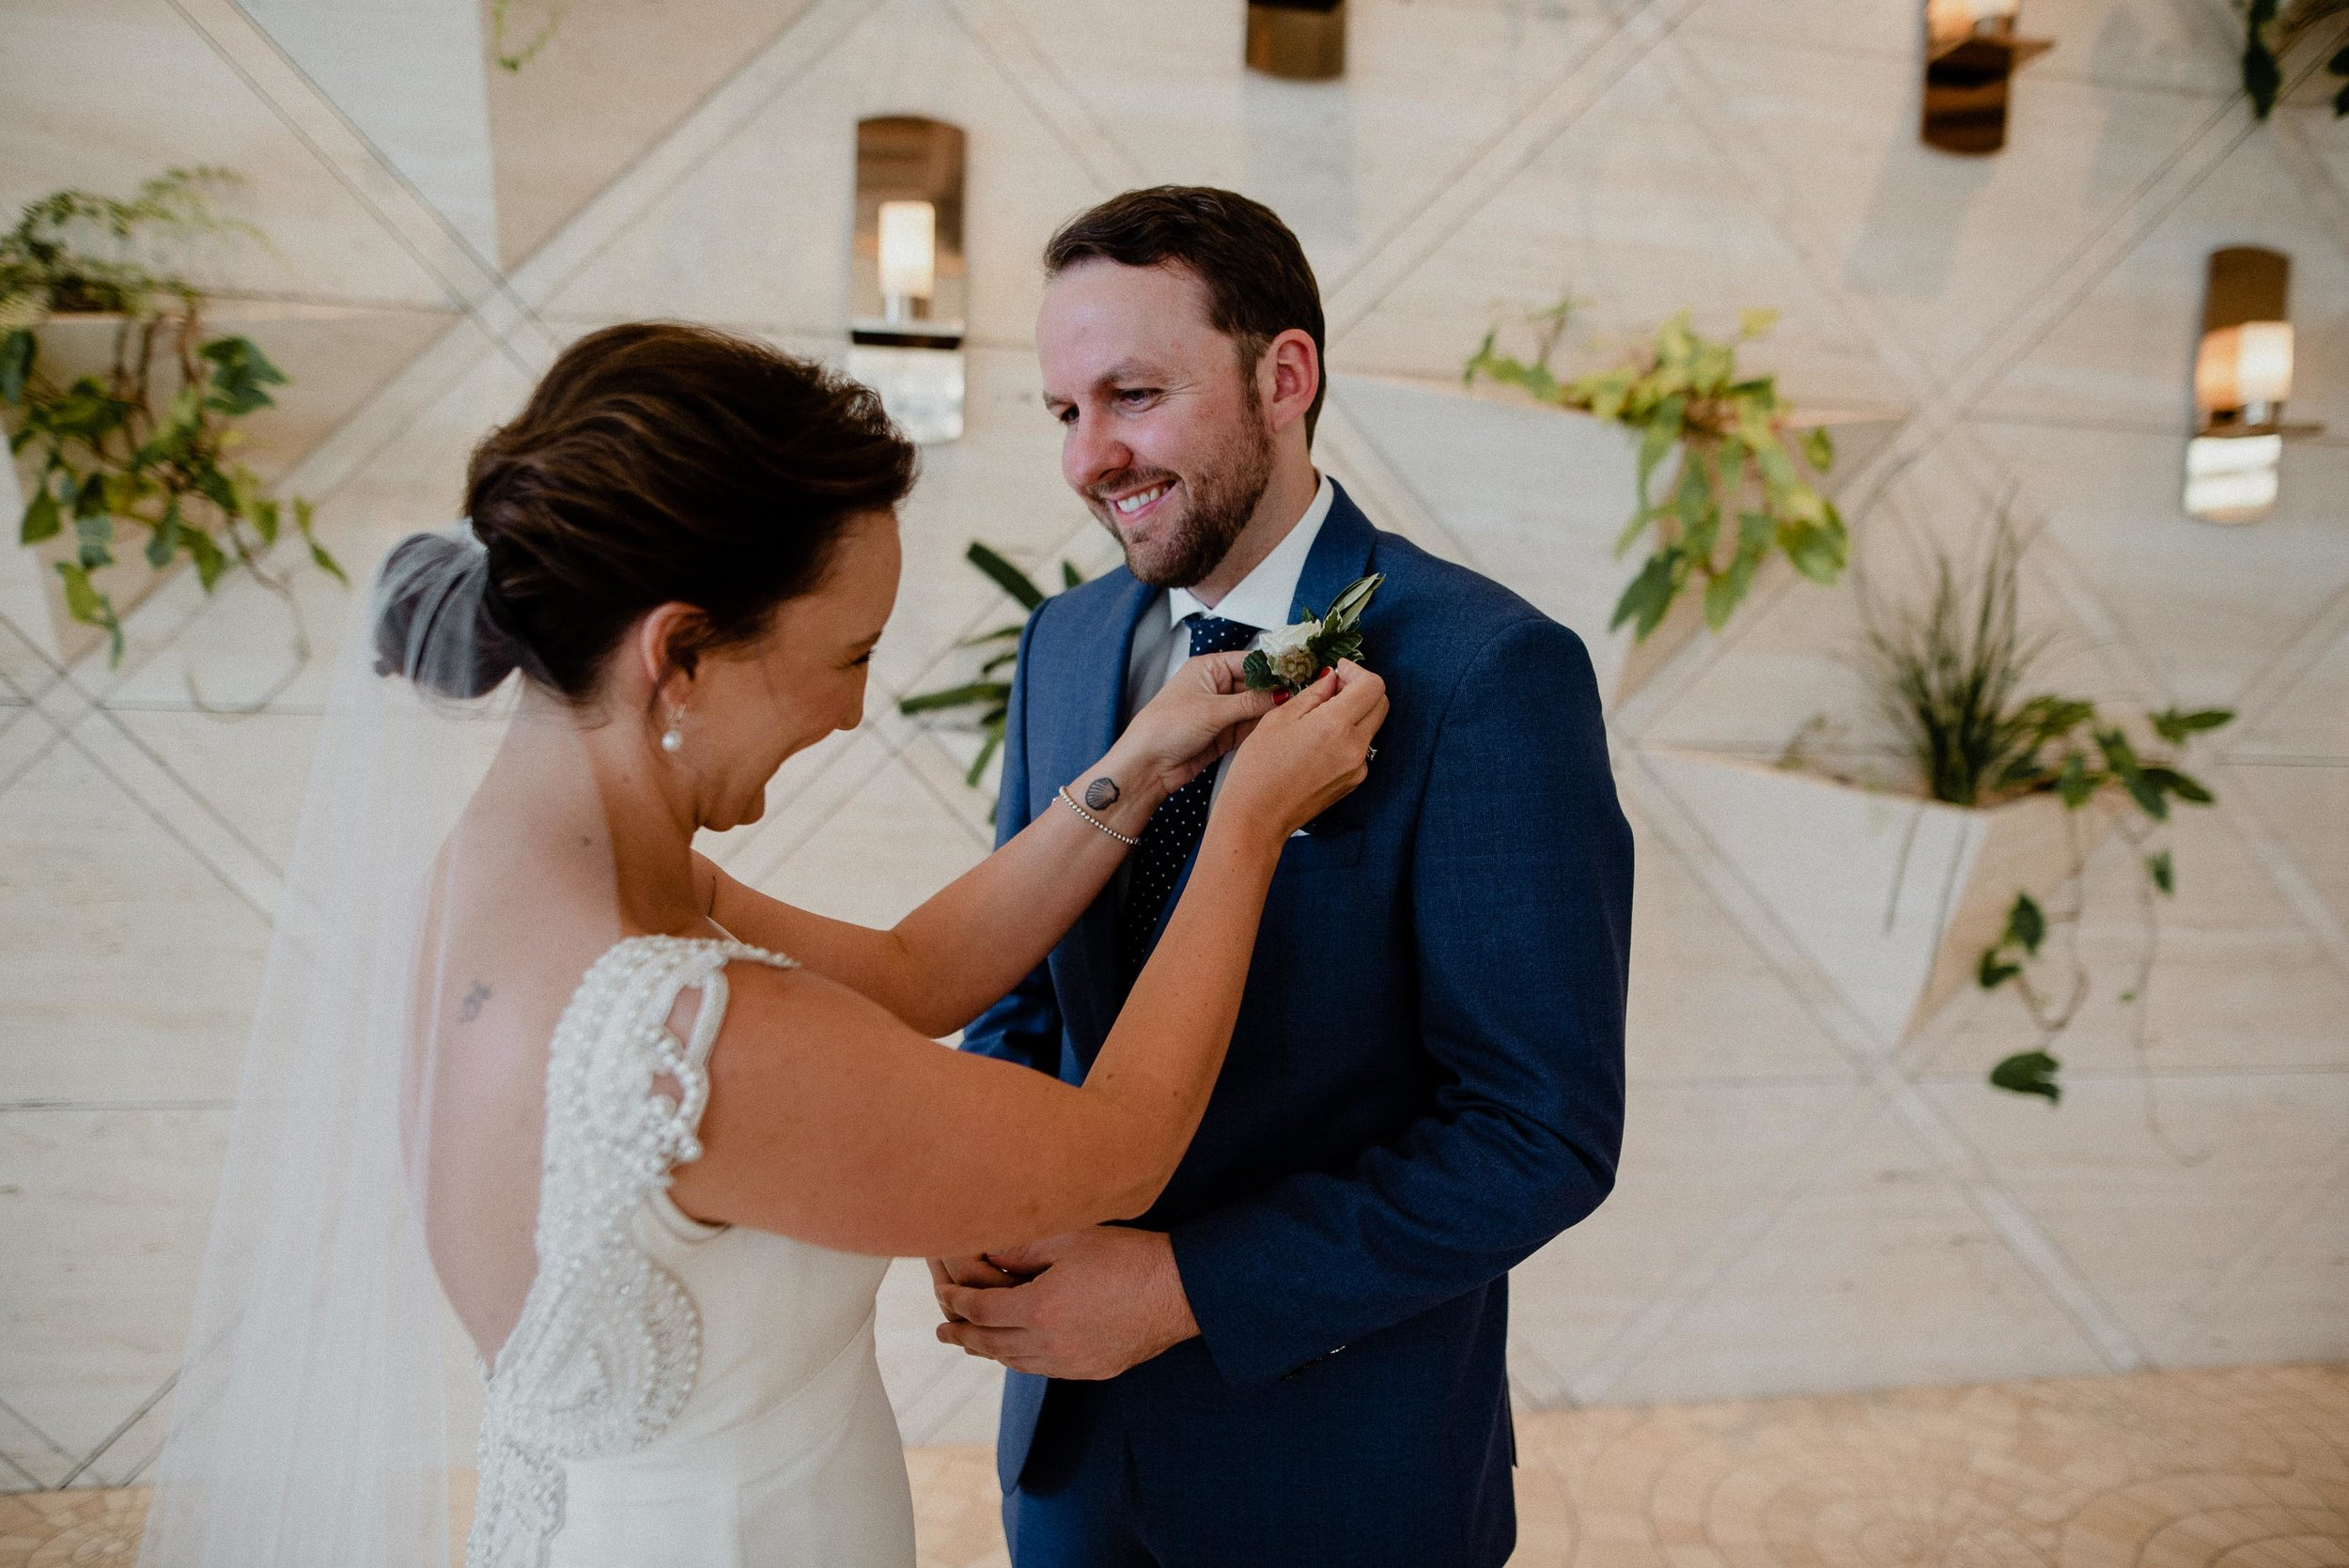 lauren-rodger-lamonts-bishops-perth-wedding-2.JPG